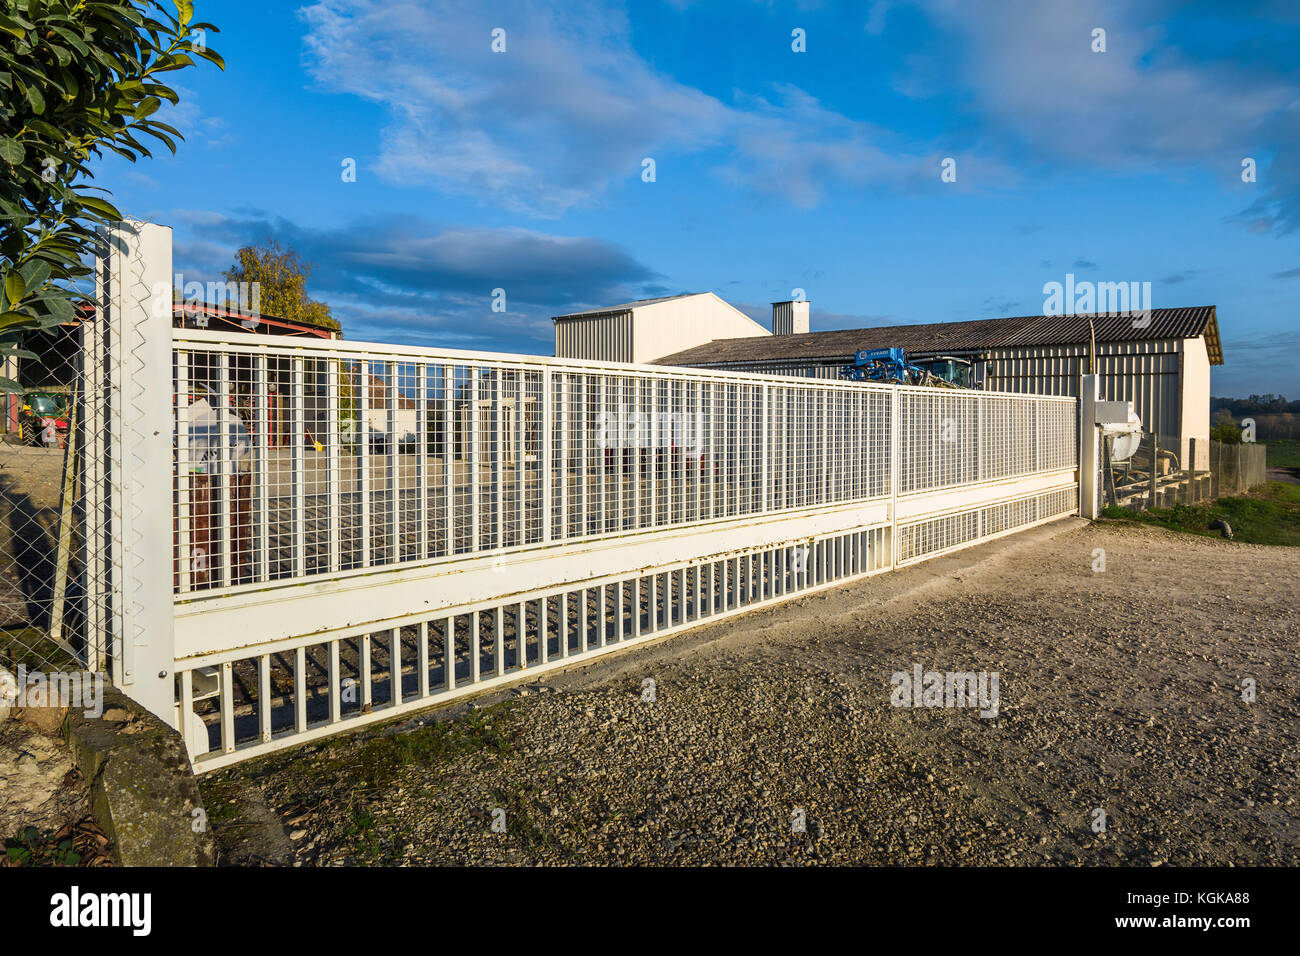 Long, sliding metal farm gate - France. - Stock Image